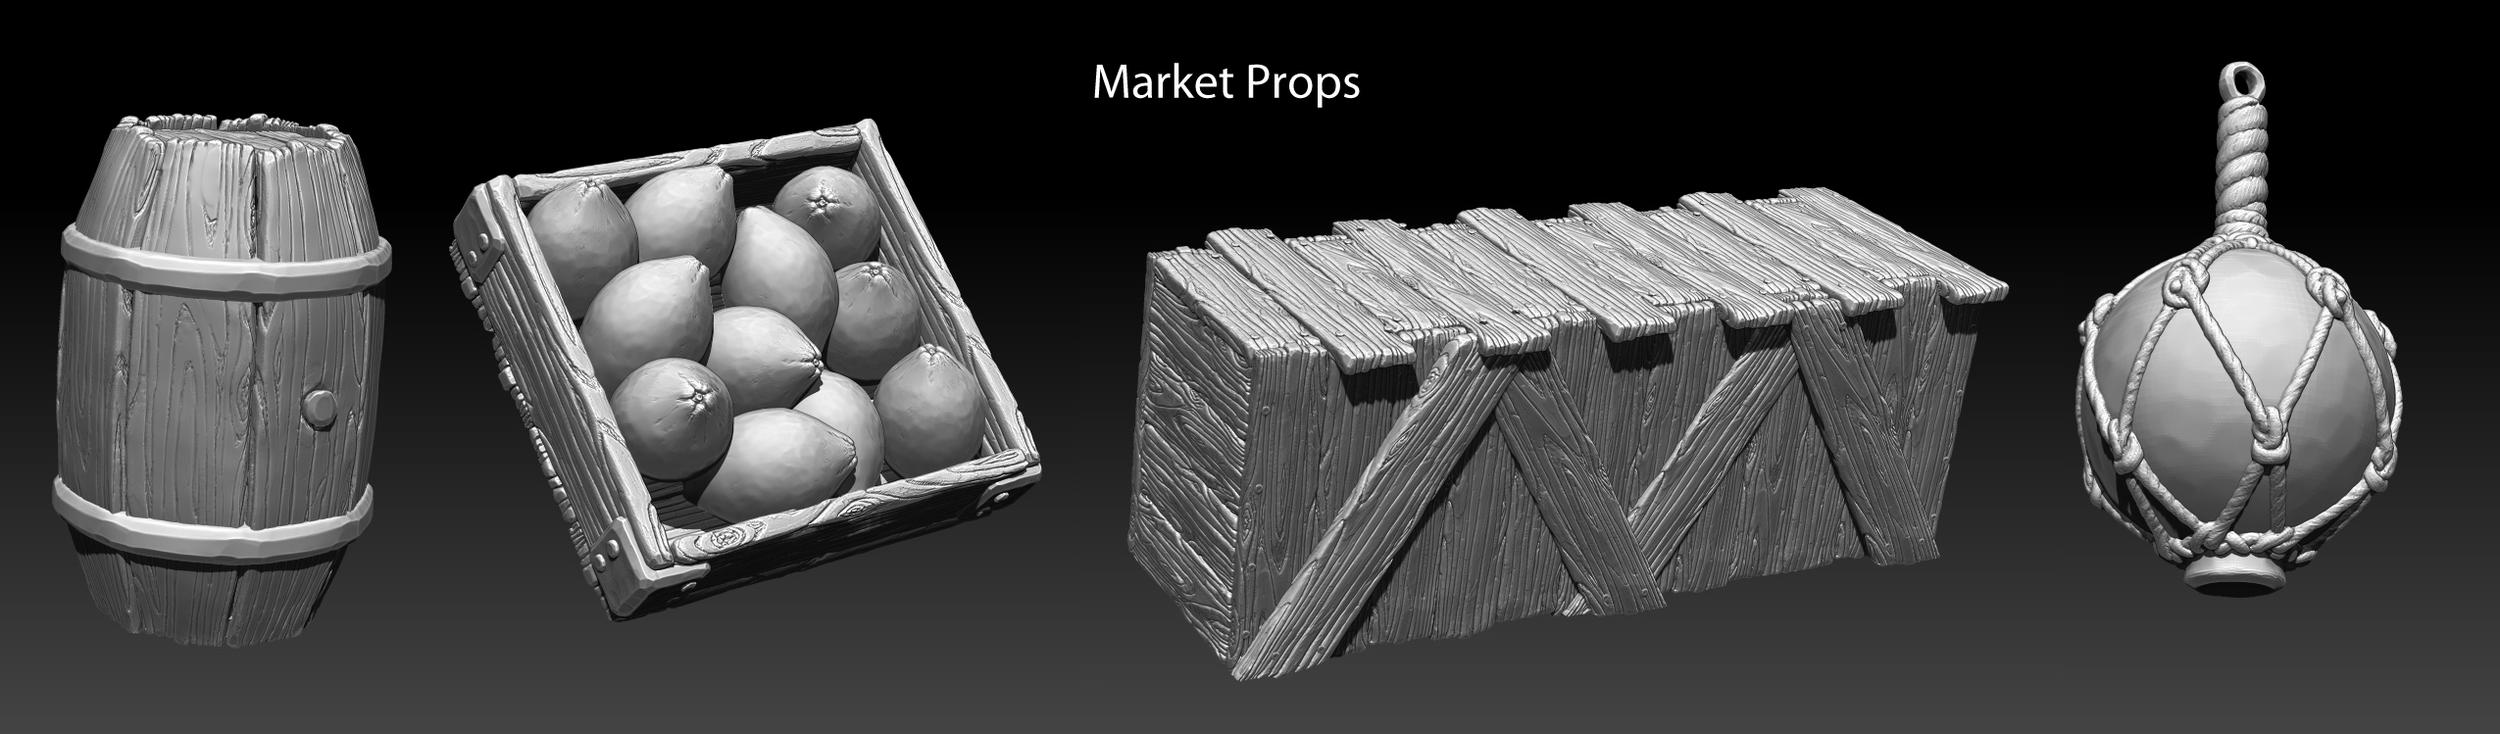 Market_props.jpg